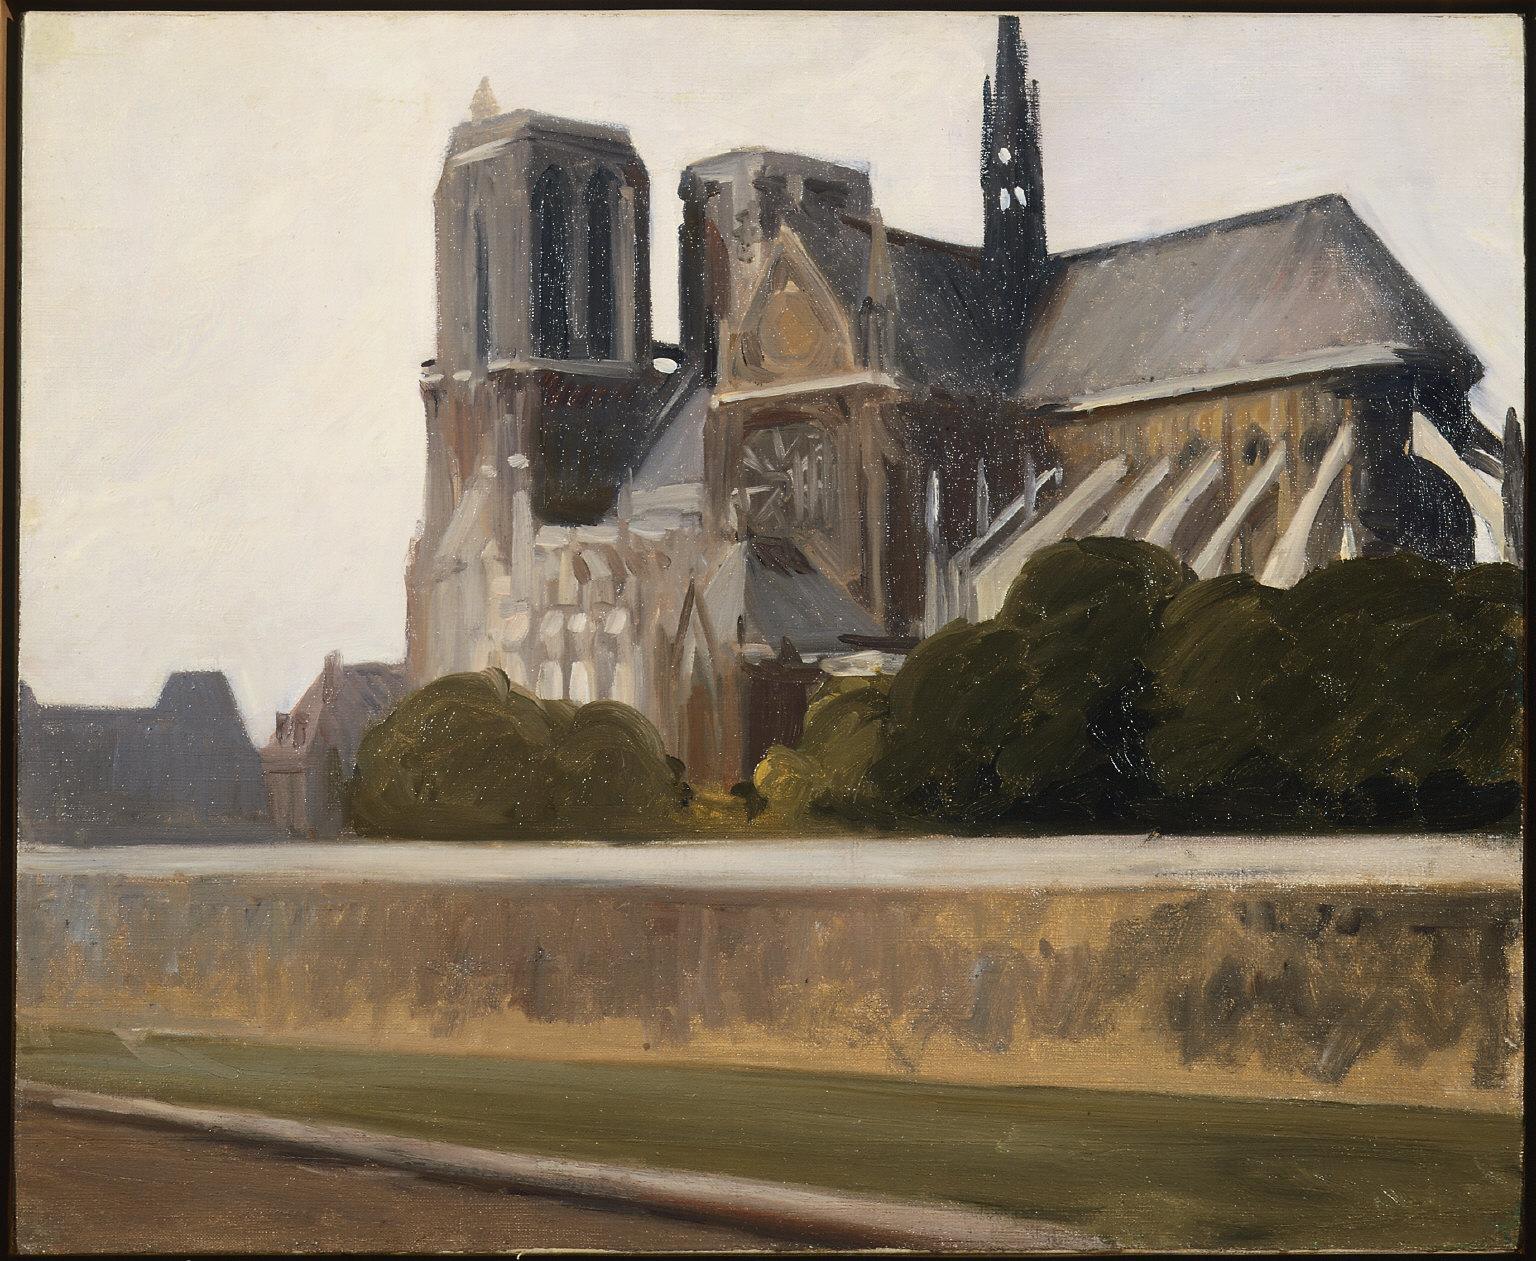 Notre Dame, No. 2